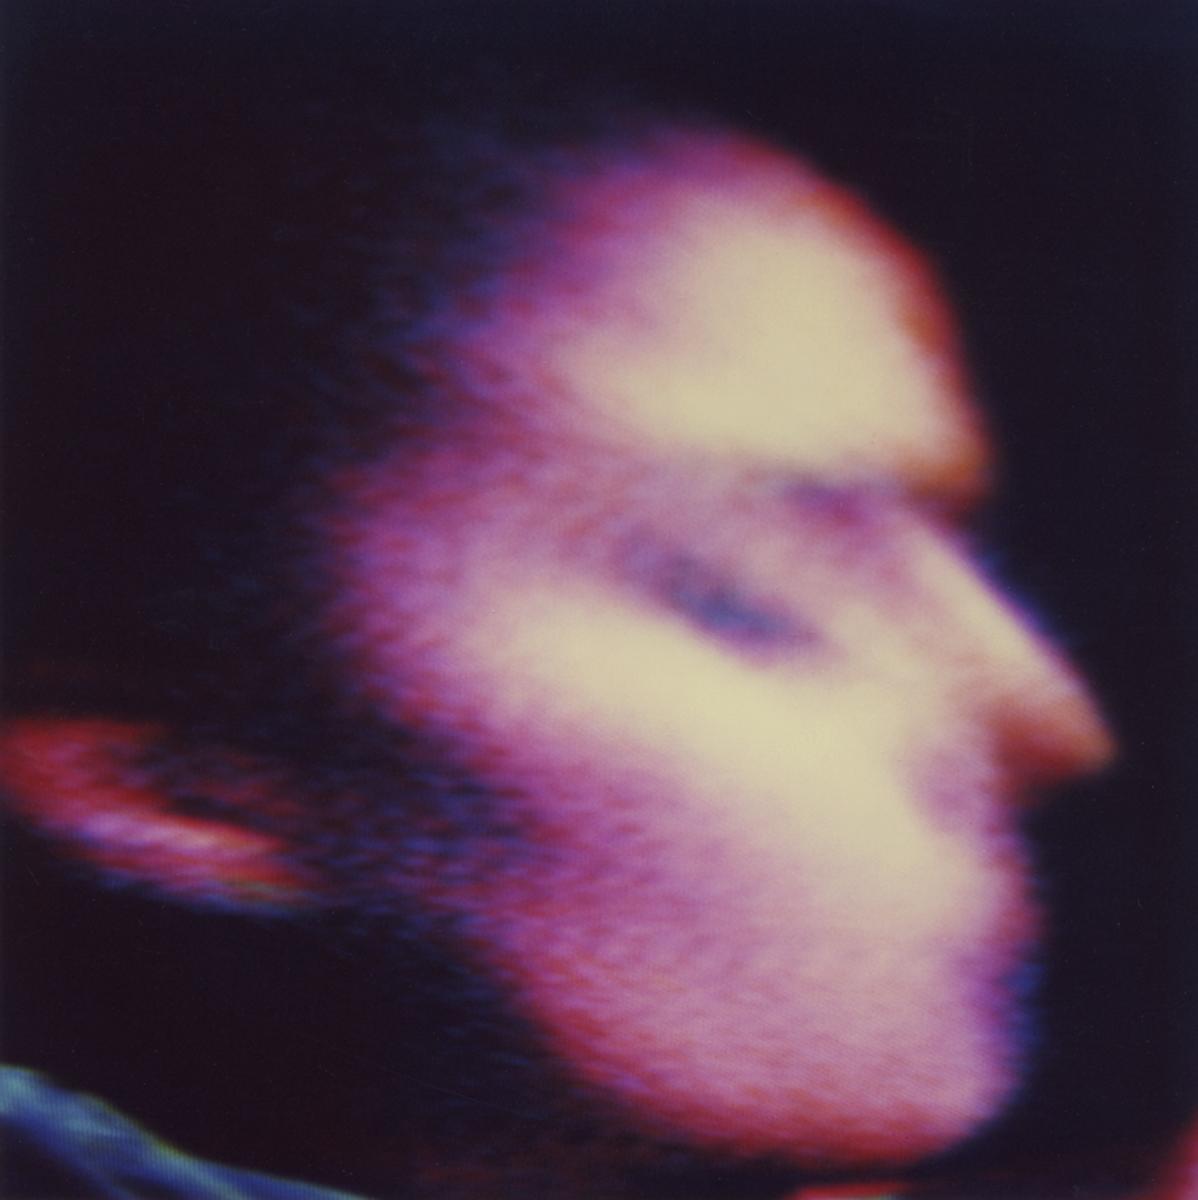 Television-TV-Polaroid-SX70-Woman-Profile-Surreal.jpg